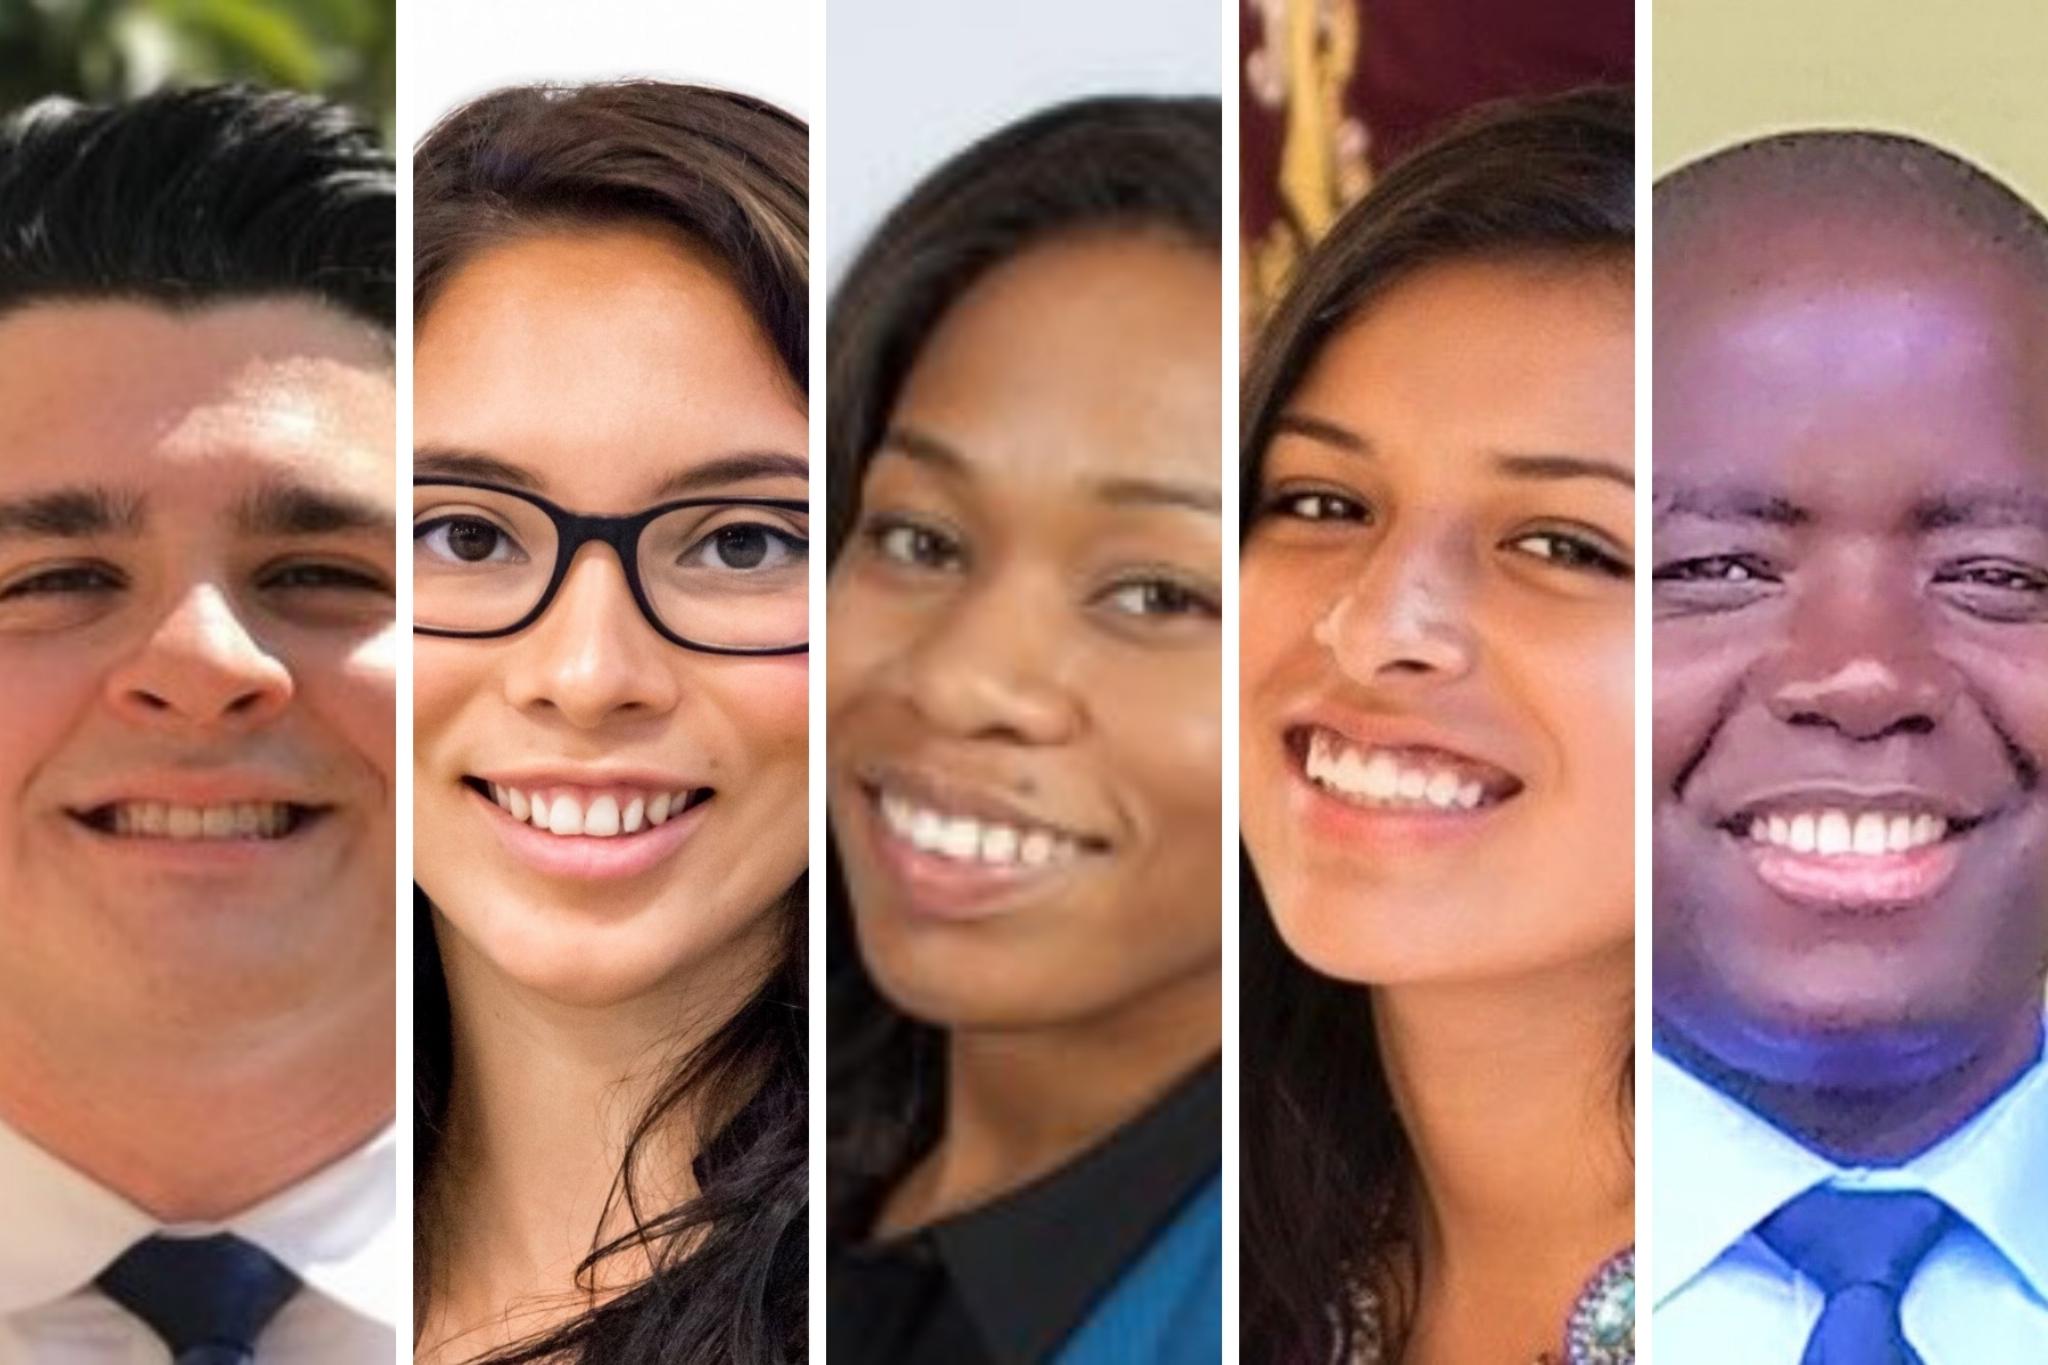 2020 cohort of Community Finance Fellows: Andrew Moncada, Essence Rodriguez, Louise Jordan, Crystal Sevilla, Benson Ochira